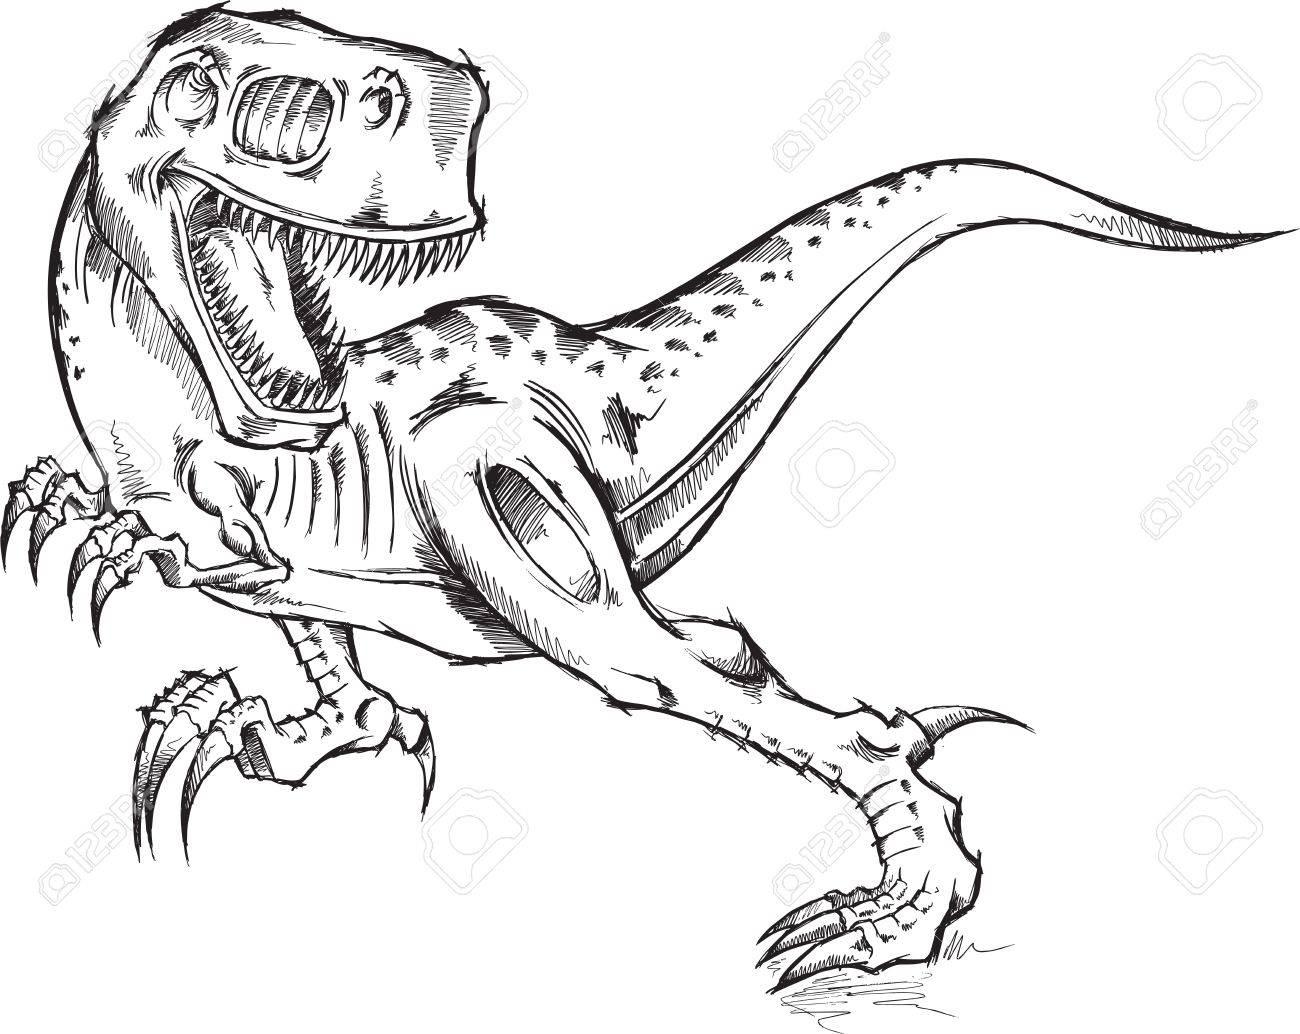 1300x1034 Sketch Doodle Tyrannosaurus Rex Dinosaur T Rex Illustration Art